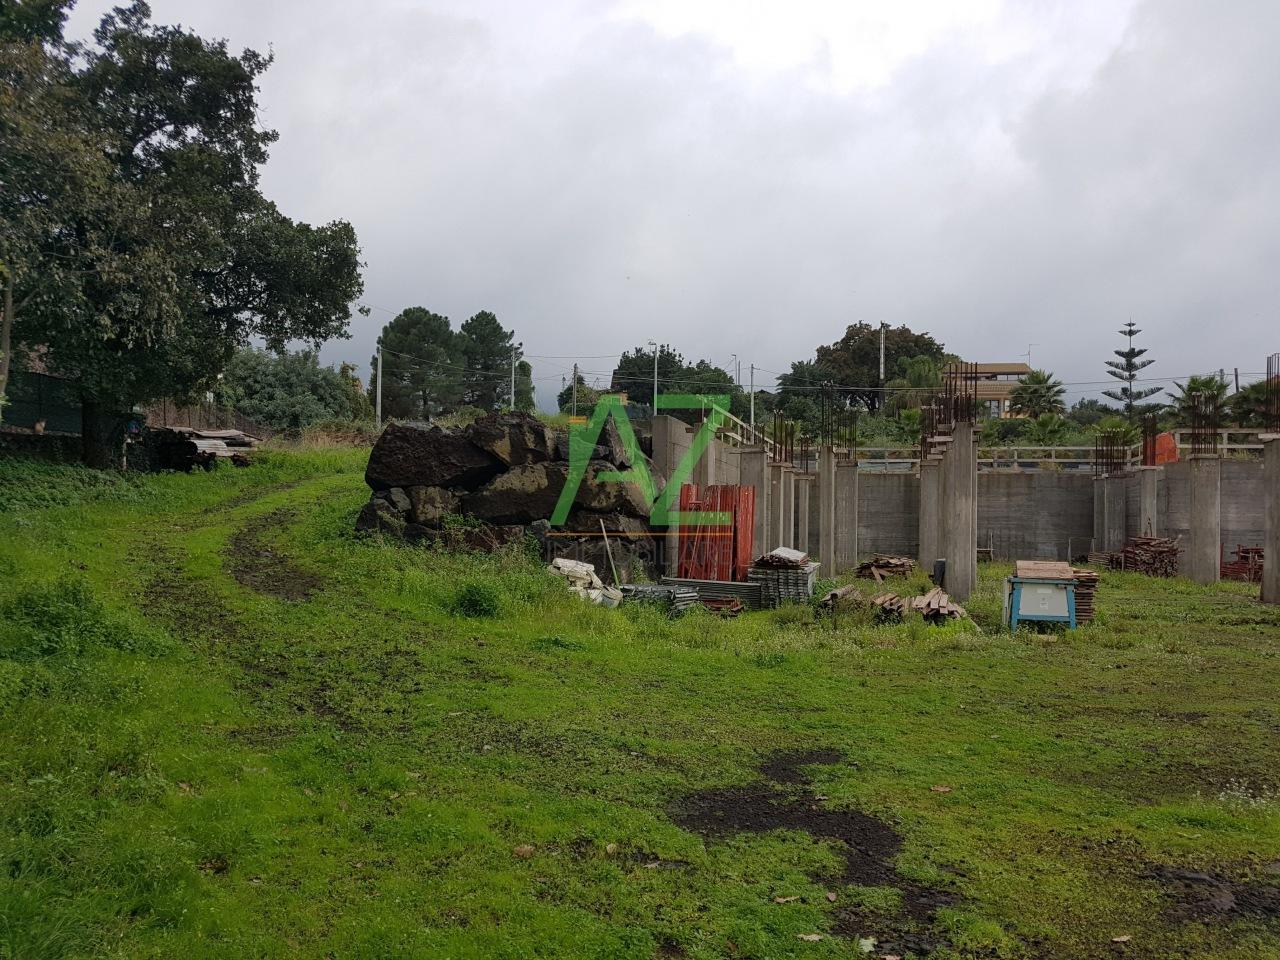 Agricolo - Area verde a Pennisi, Acireale Rif. 4149172